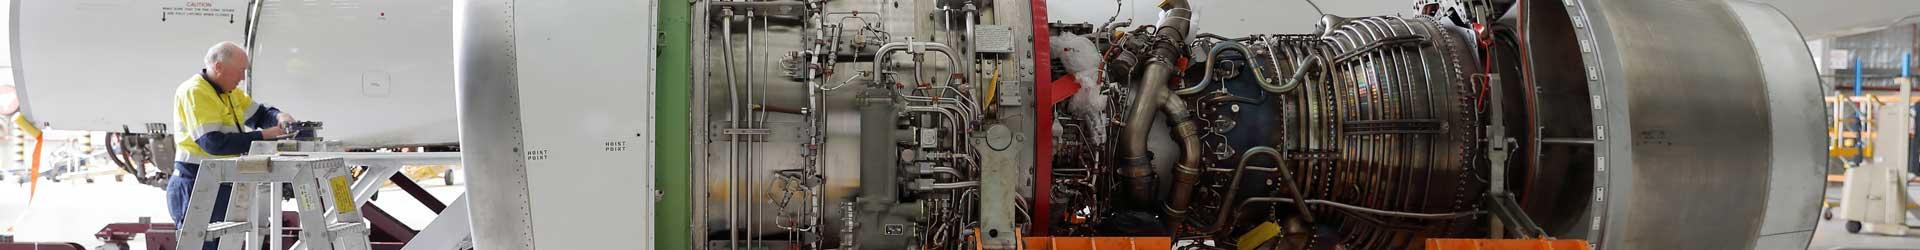 Aviat Global engineer working on a V2500 jet engine